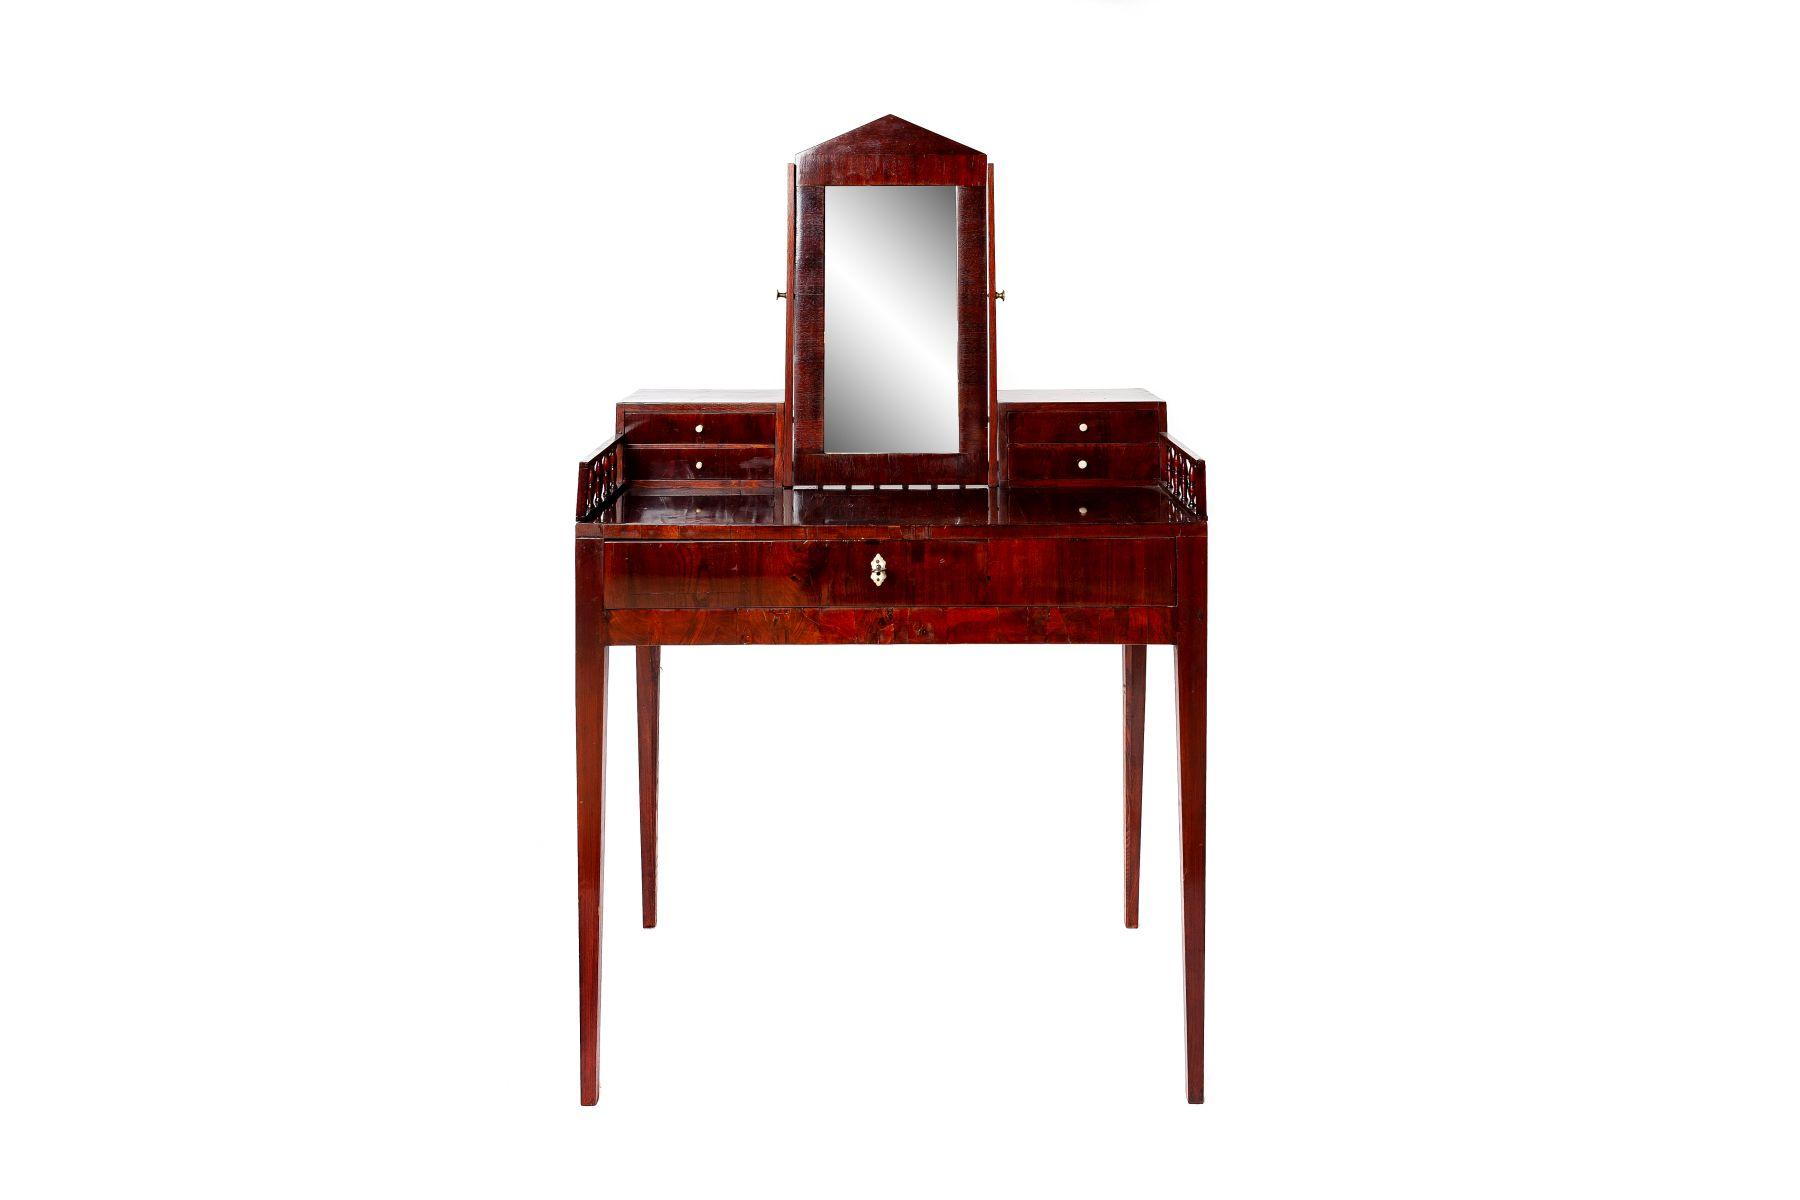 #2 Biedermeier Dresser | Biedermeier Kommode Image